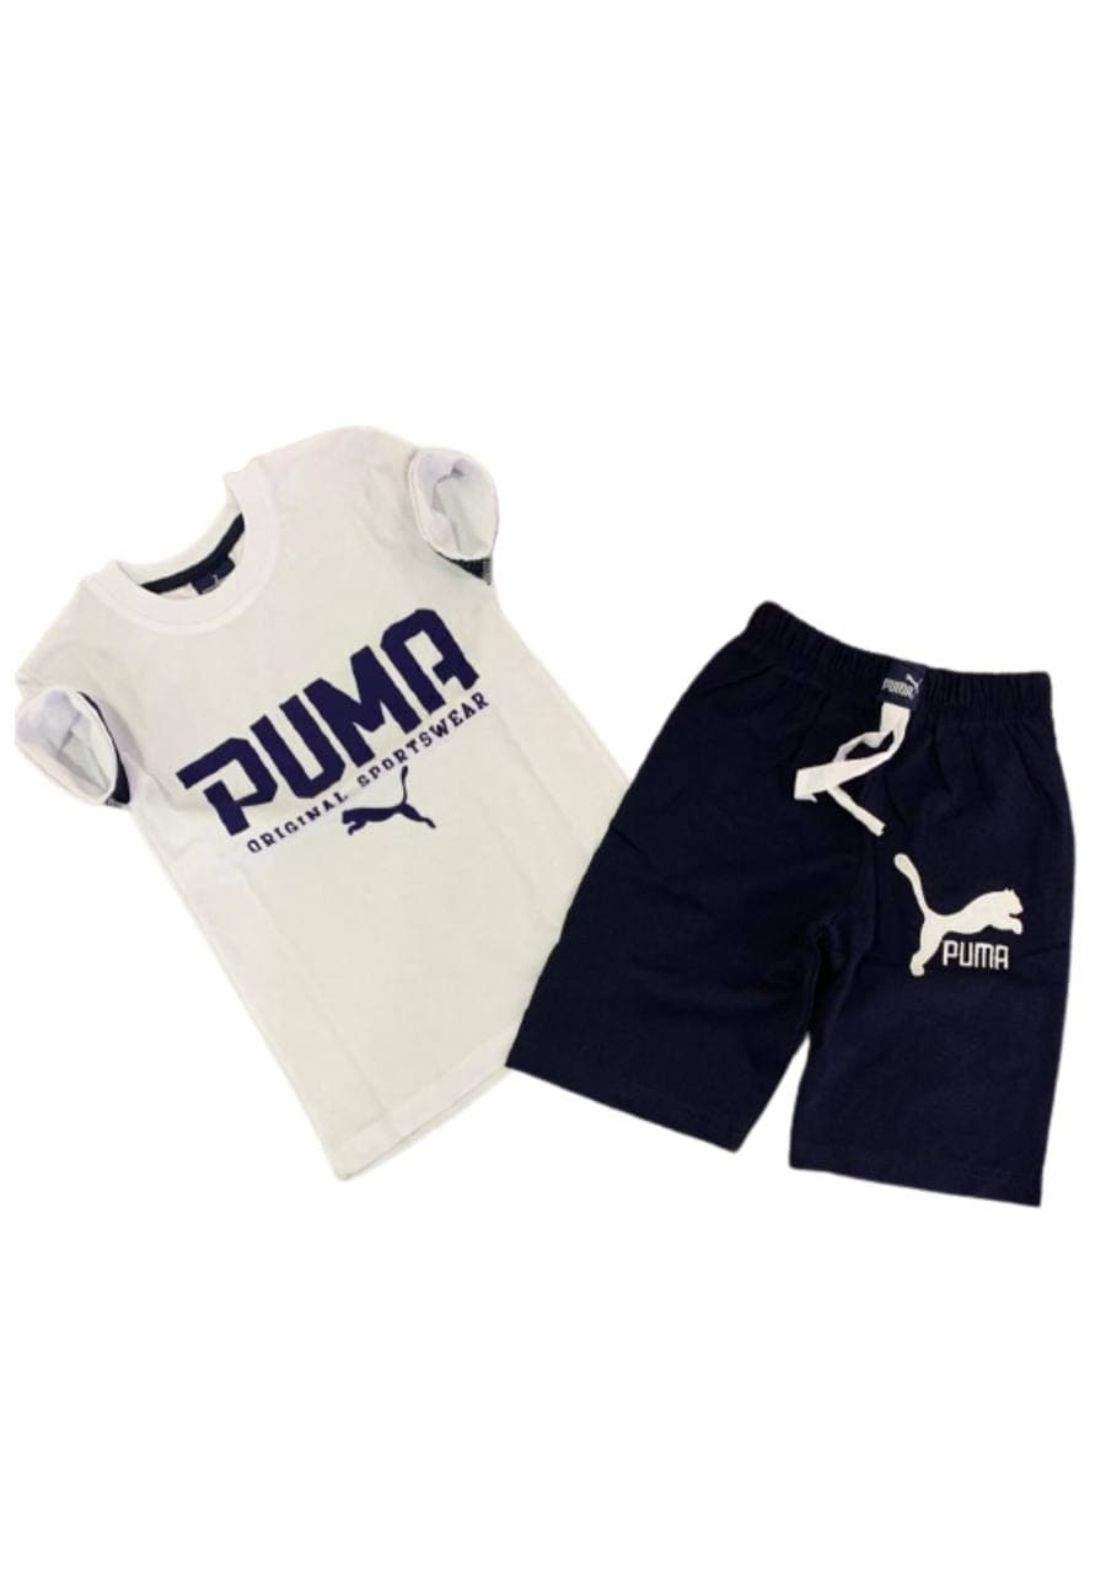 tracksuit for boys  white (t-shirt+short) ( تراكسوت ولادي  ابيض (شورت و تيشيرت